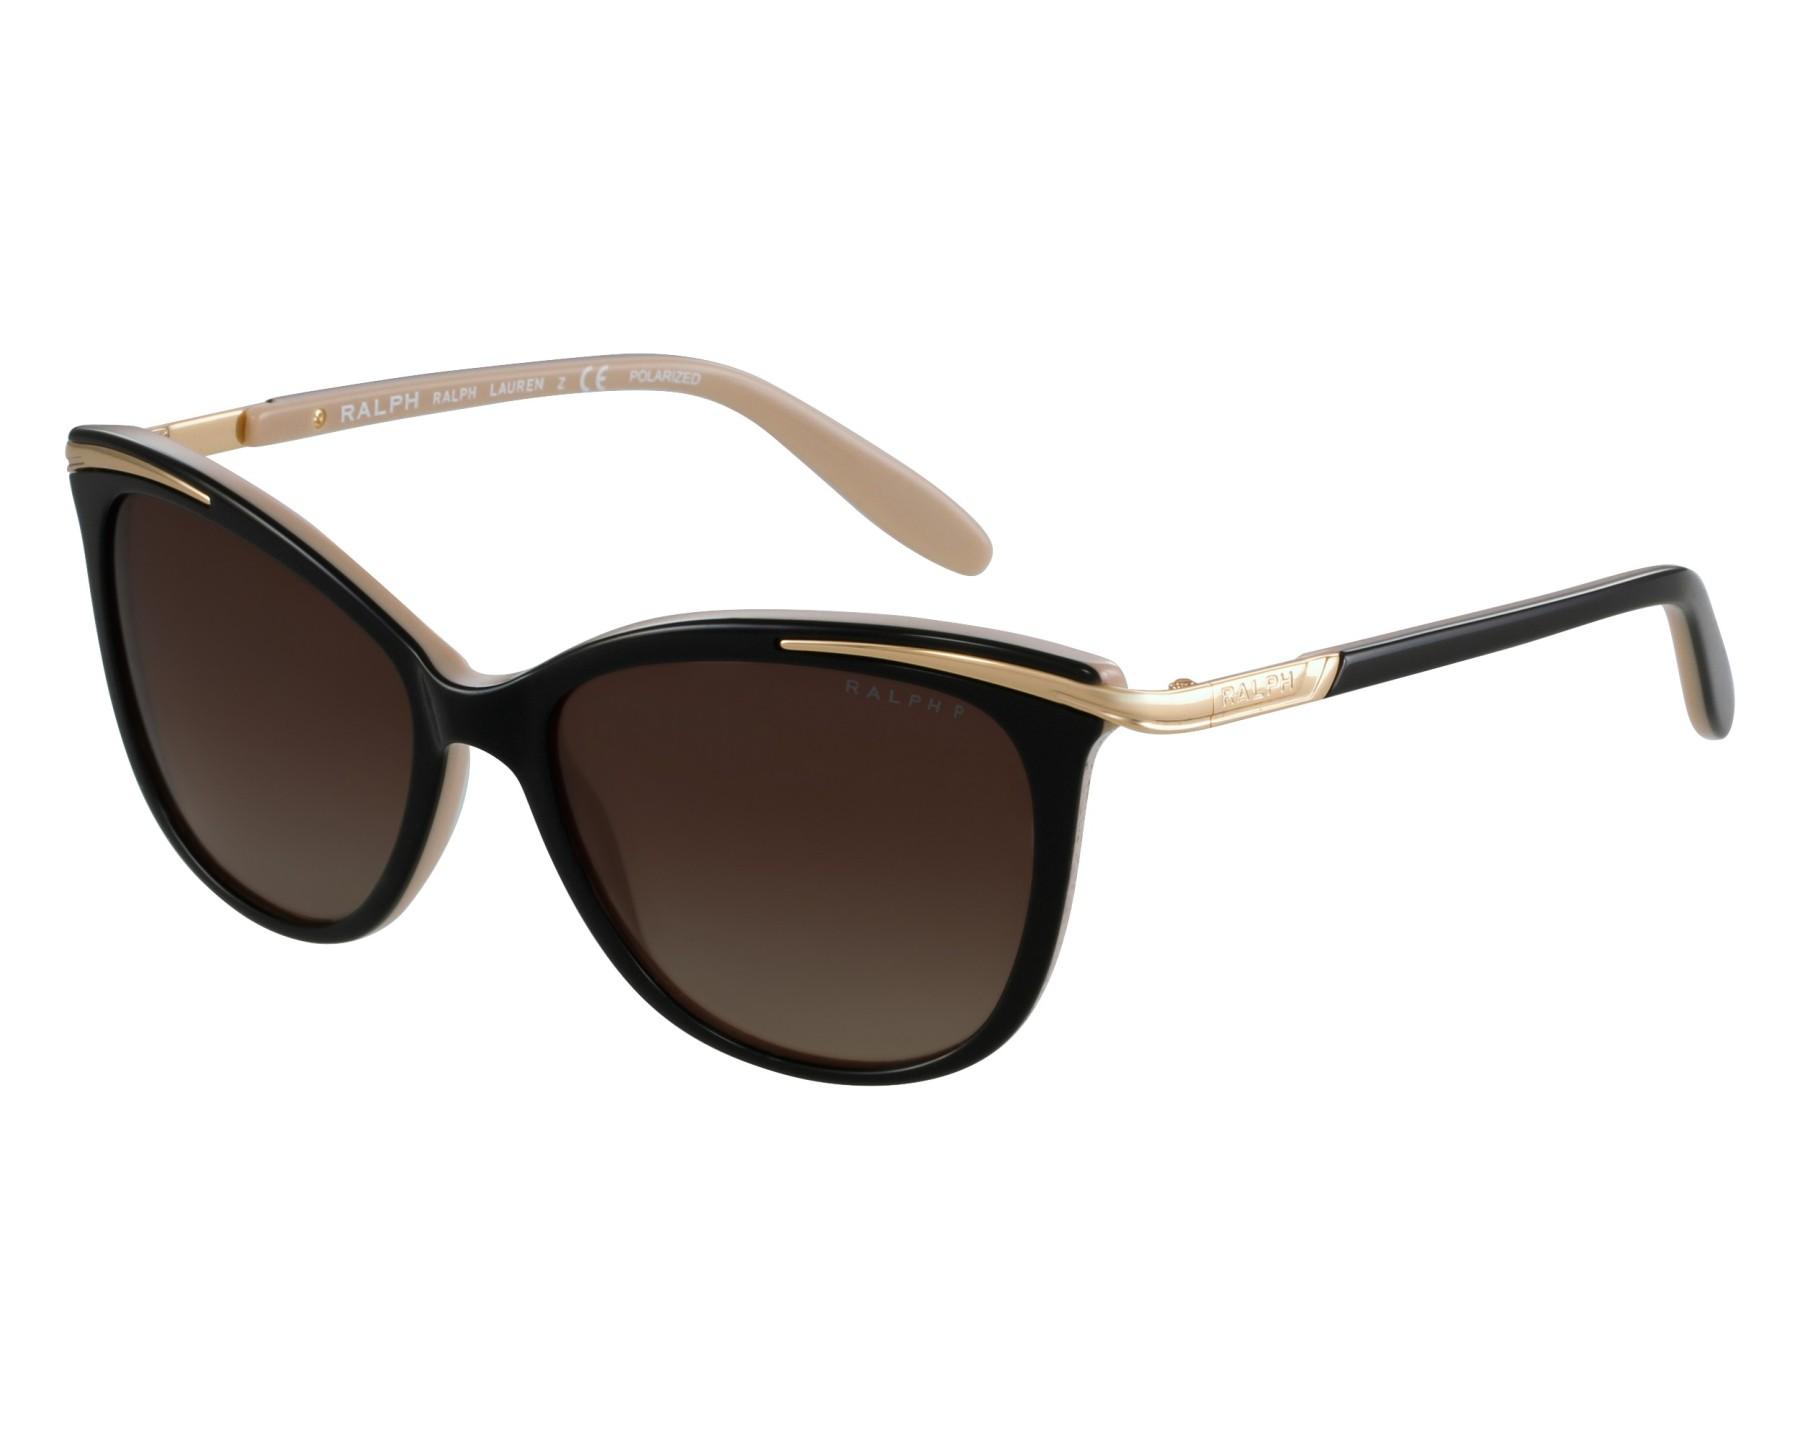 2d7ff2f984 Gafas de sol Ralph Lauren RA-5203 1090/T5 54-16 Negra Beige